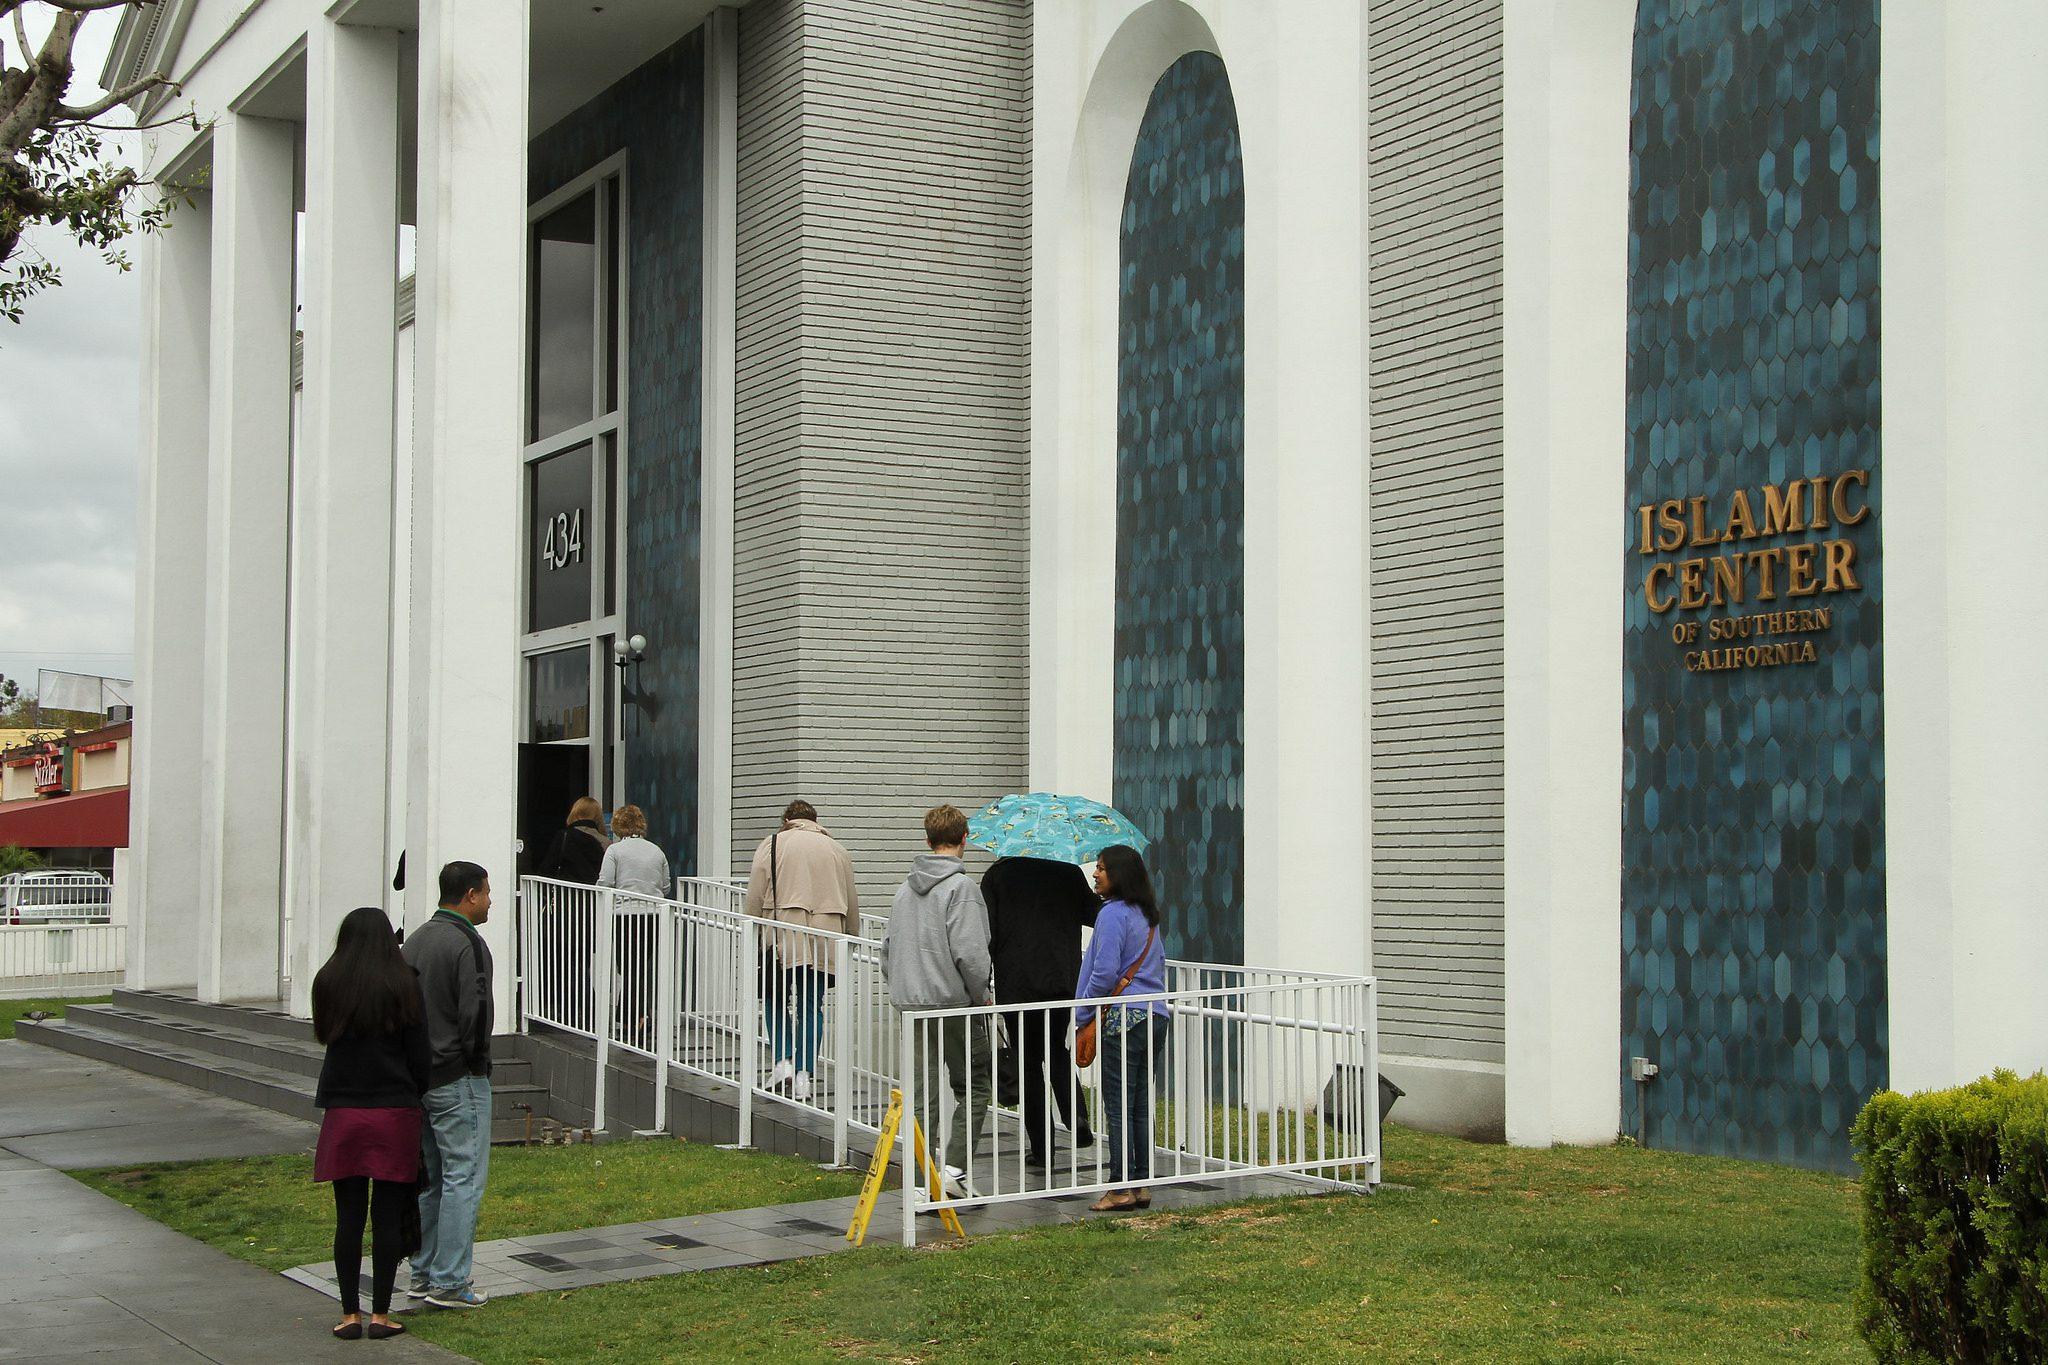 Islamic Center Southern California